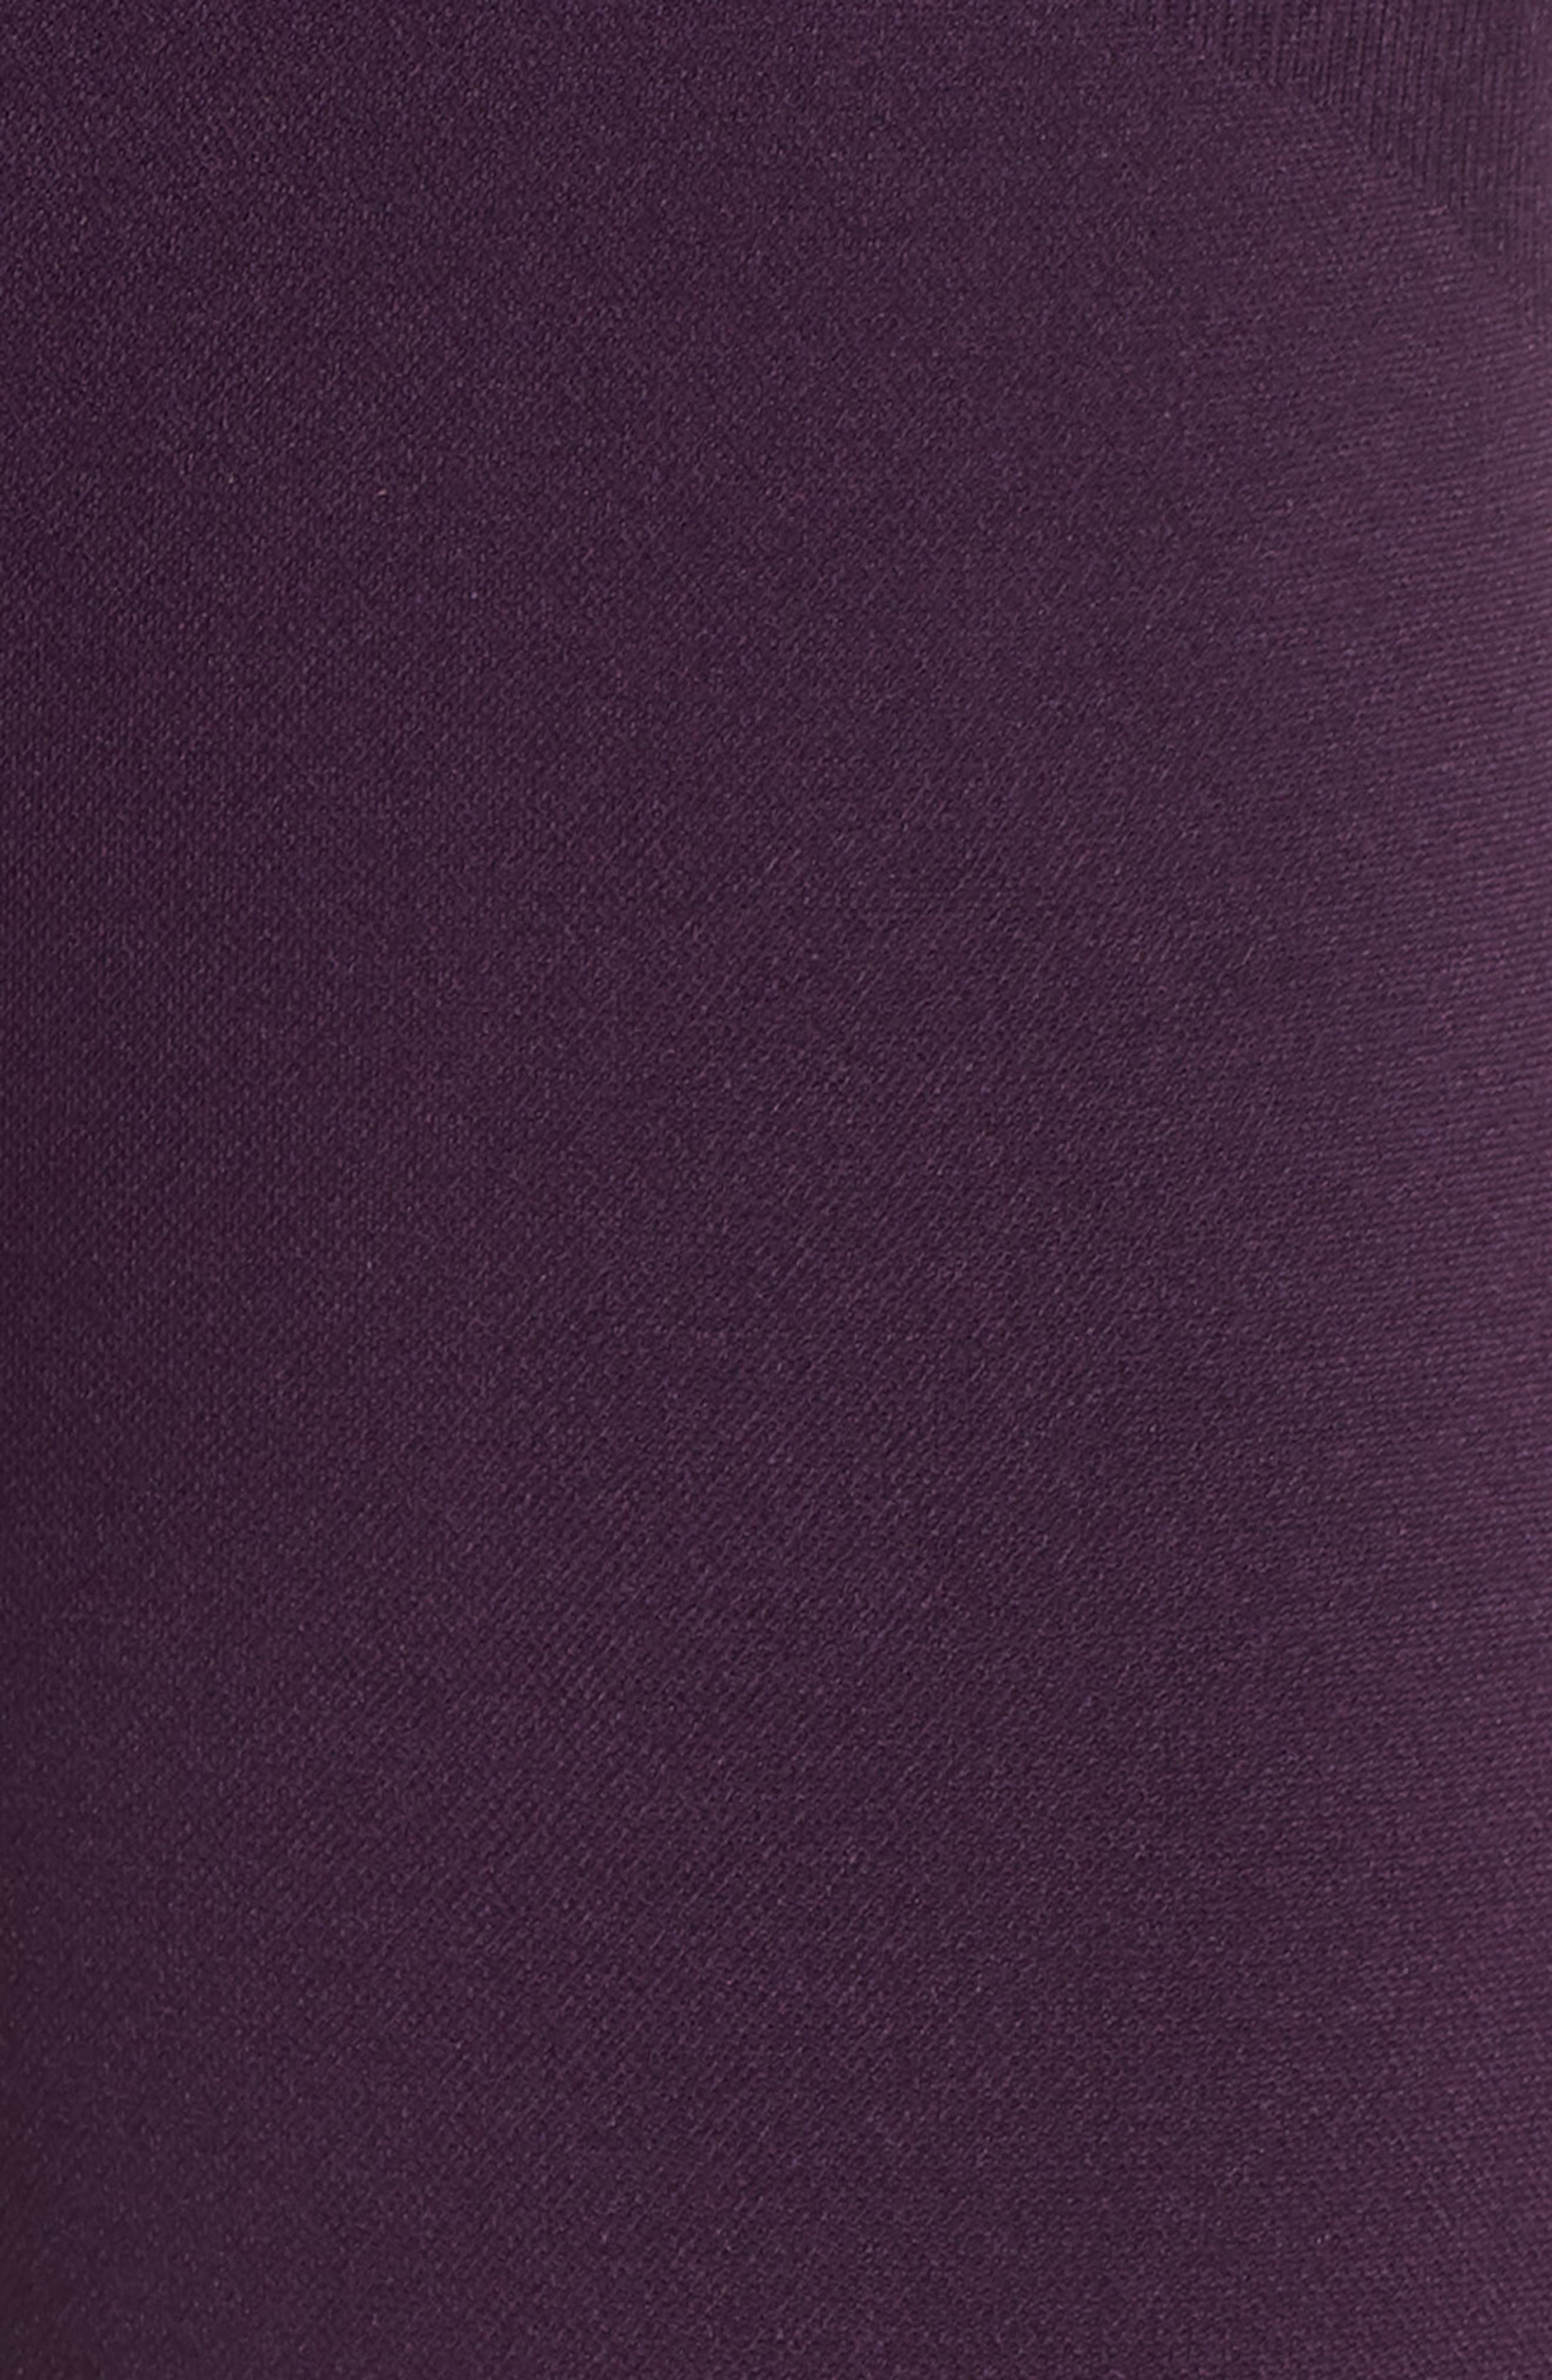 Millie Perforated Crop Leggings,                             Alternate thumbnail 5, color,                             PURPLE PENNANT